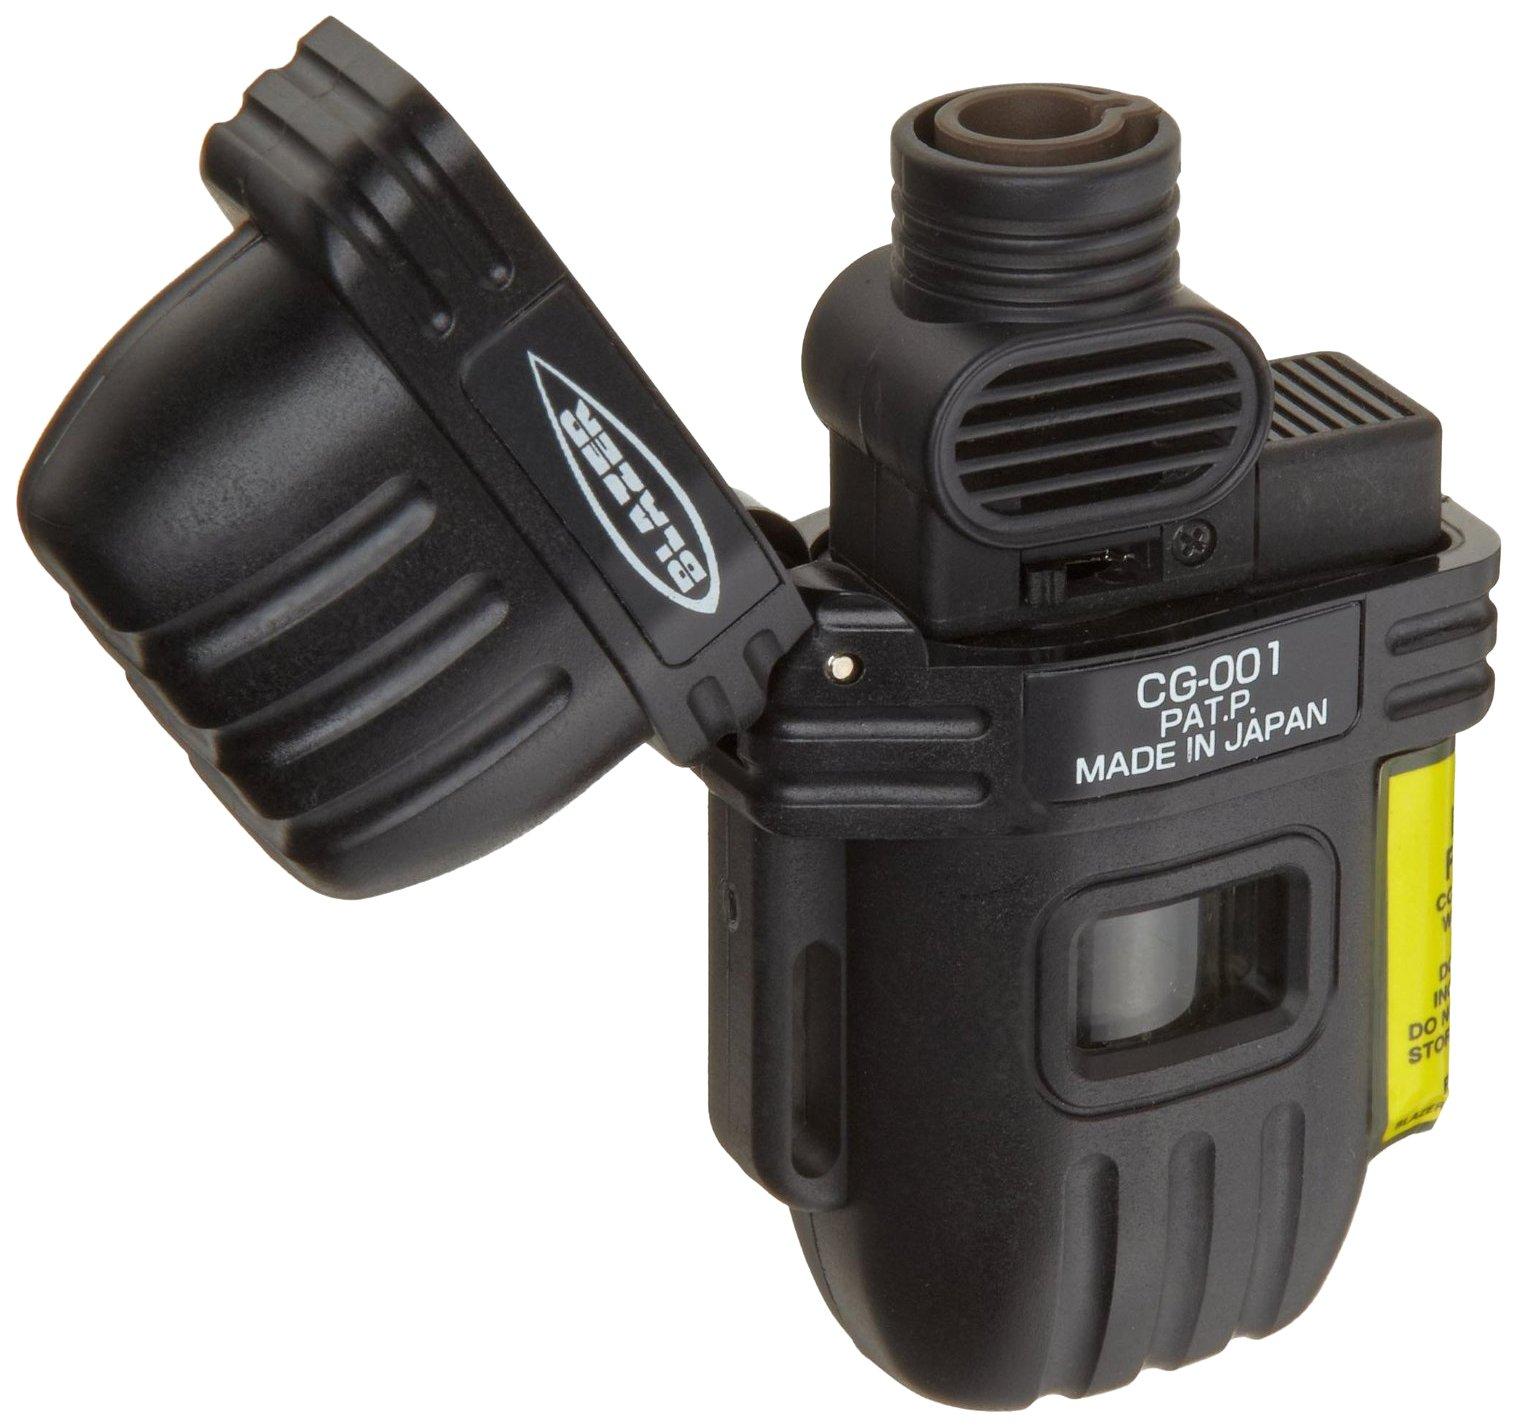 Blazer CG-001 Wide Flame Butane Refillable Torch Lighter, Black